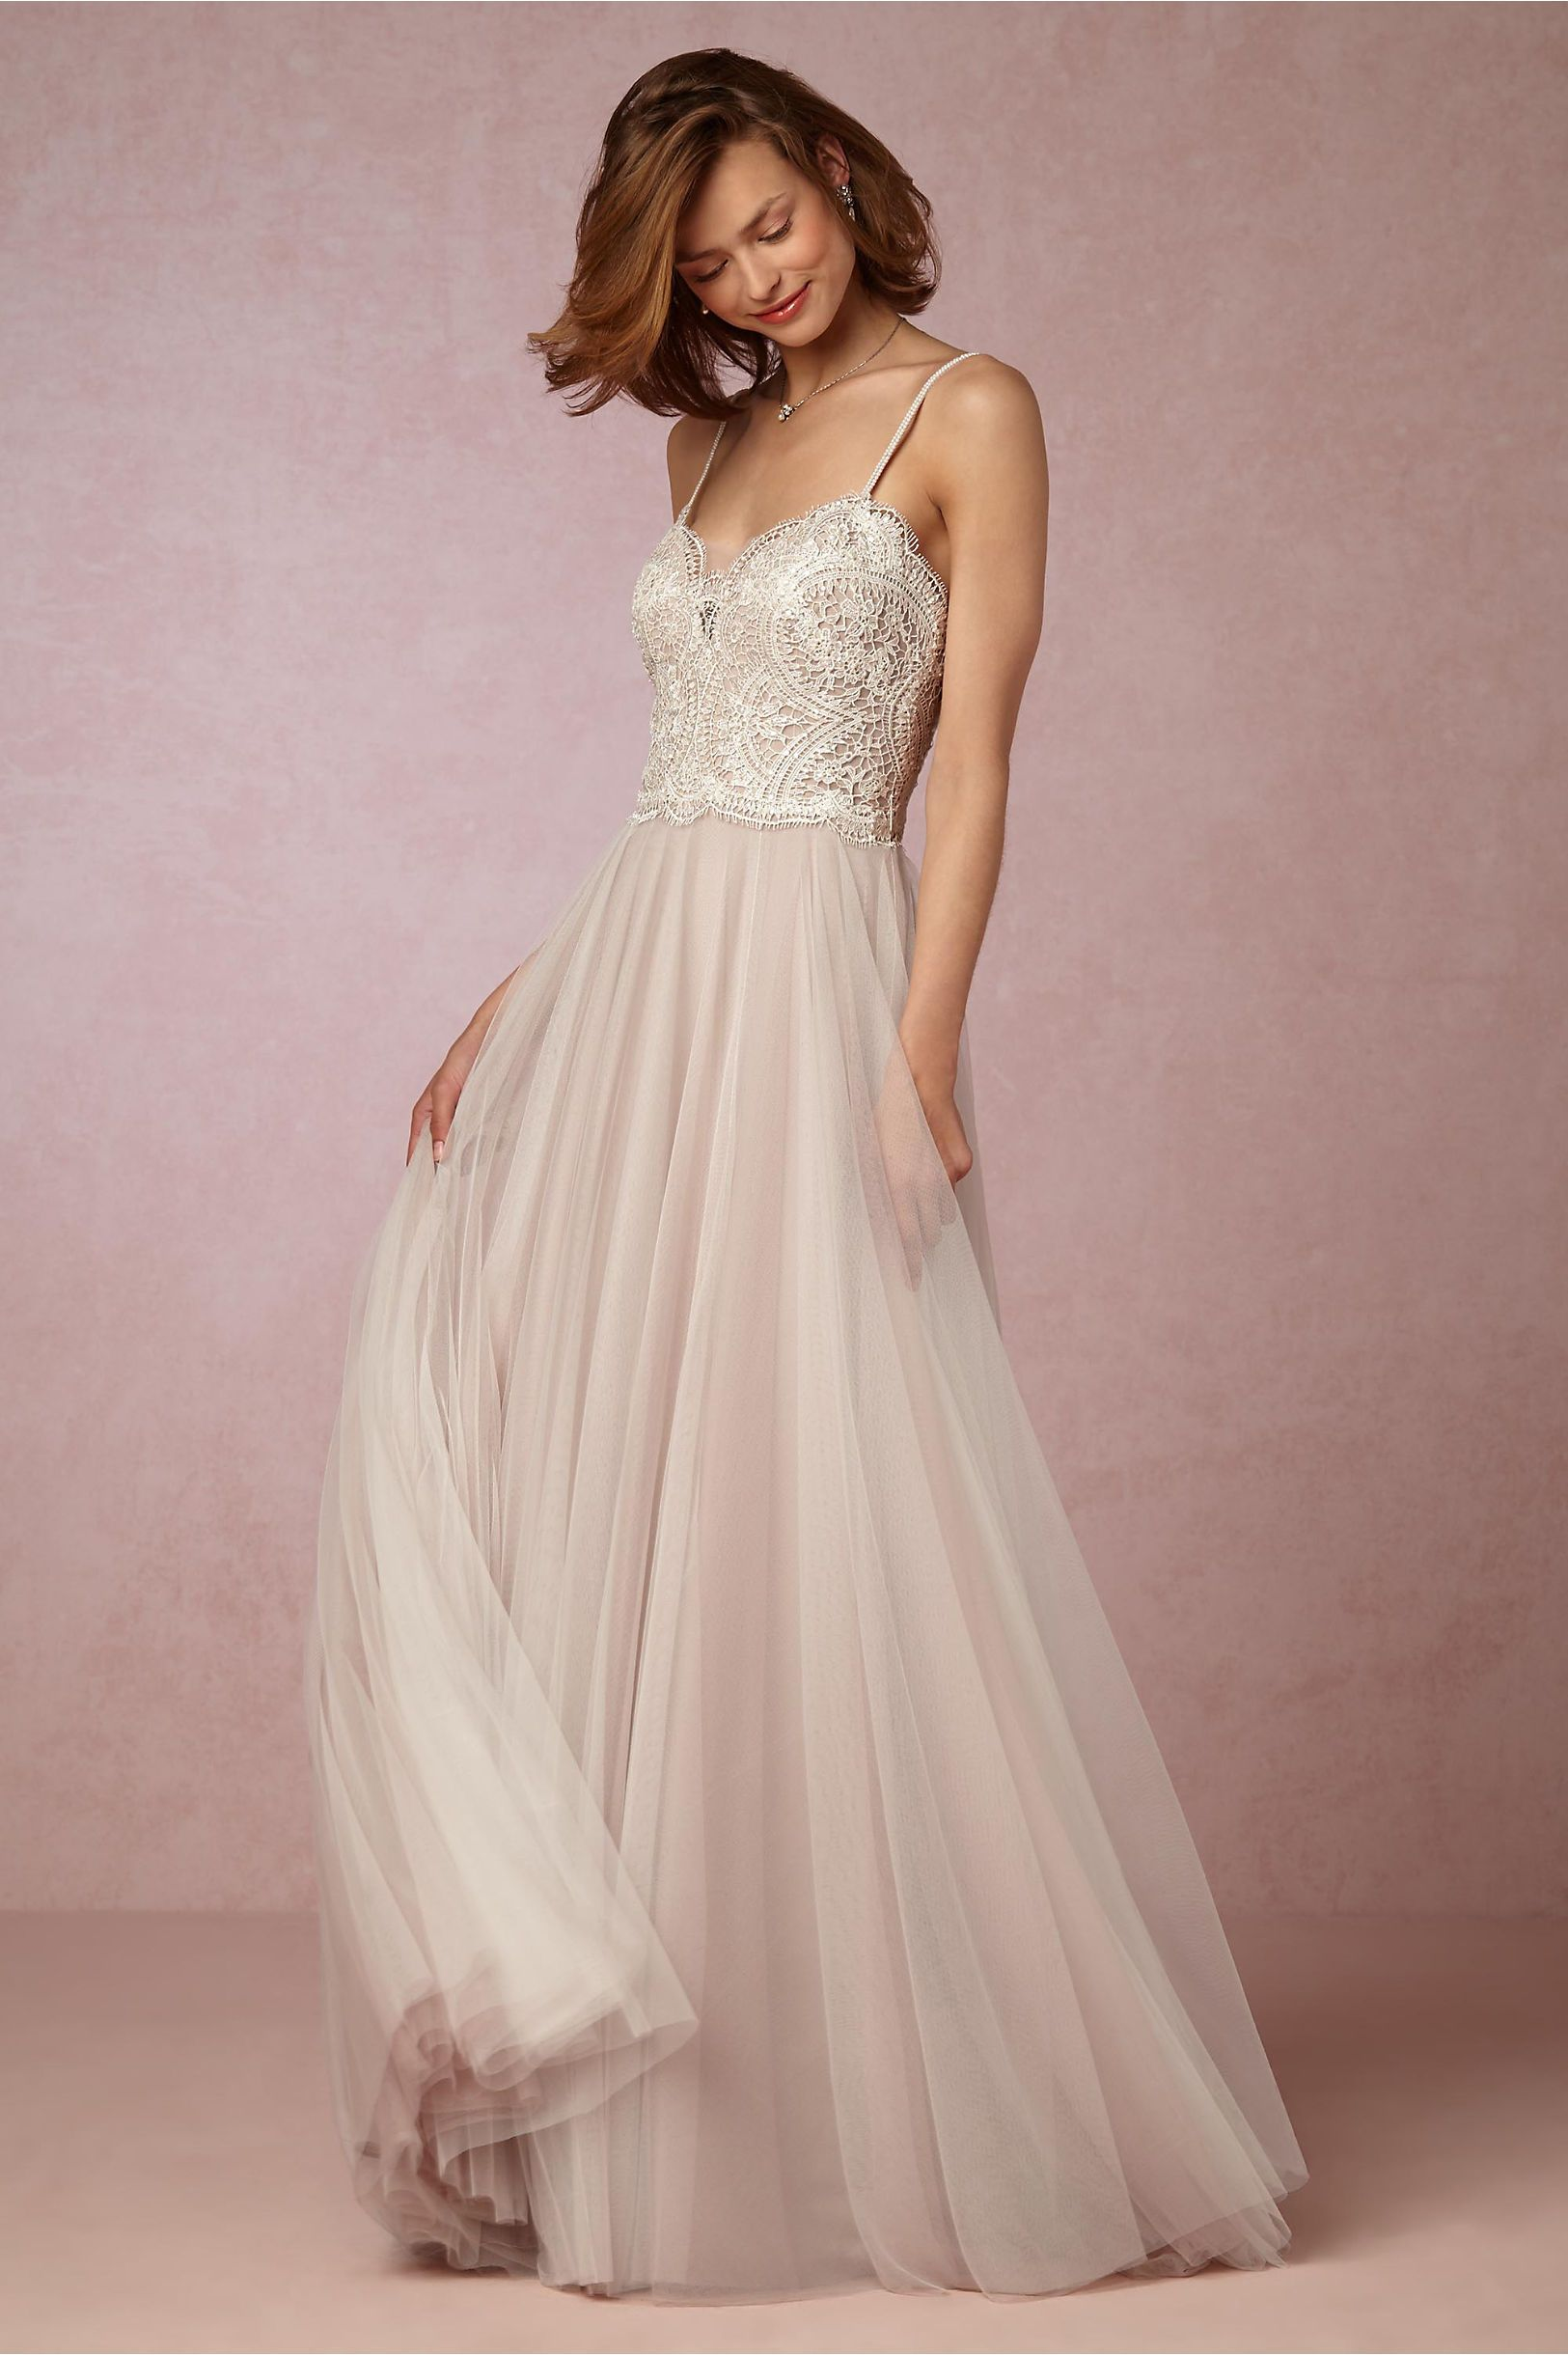 BHLDN Nina Gown in Sale Wedding Dresses  BHLDN  Wedding dresses